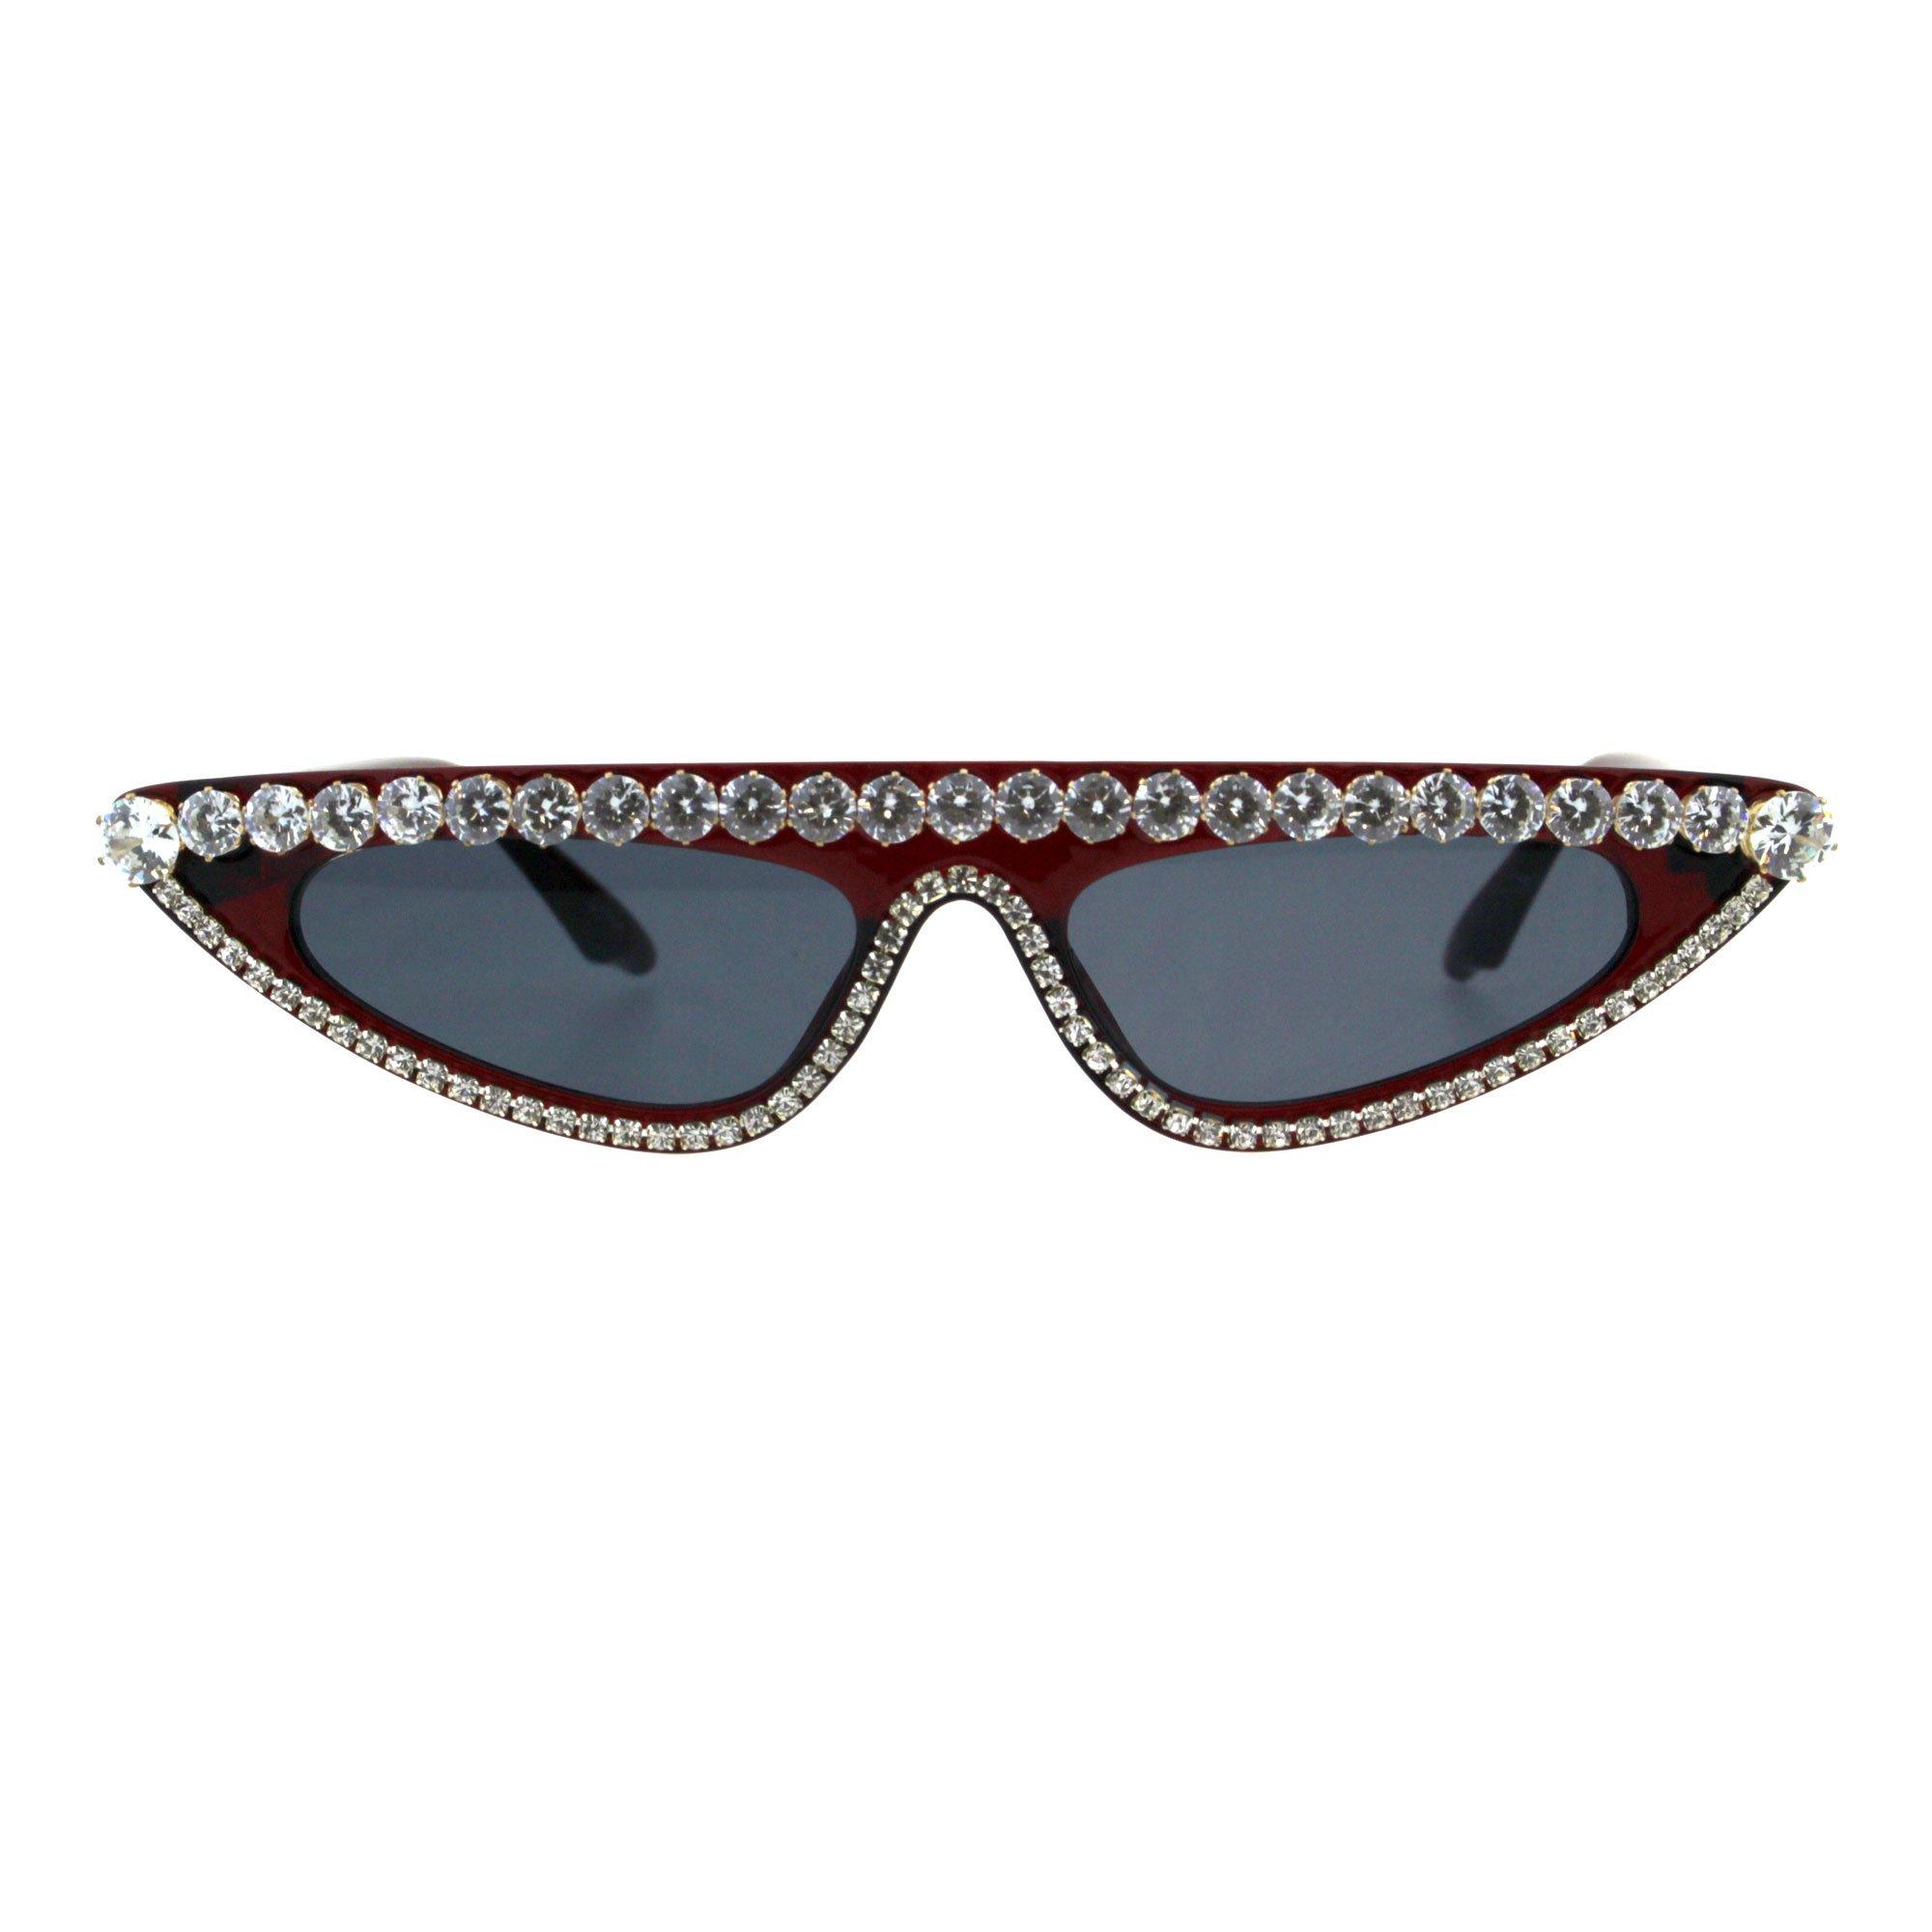 Womens Large Rhinestone Bling Flat Top Narrow Cat Eye Goth Sunglasses Burgundy